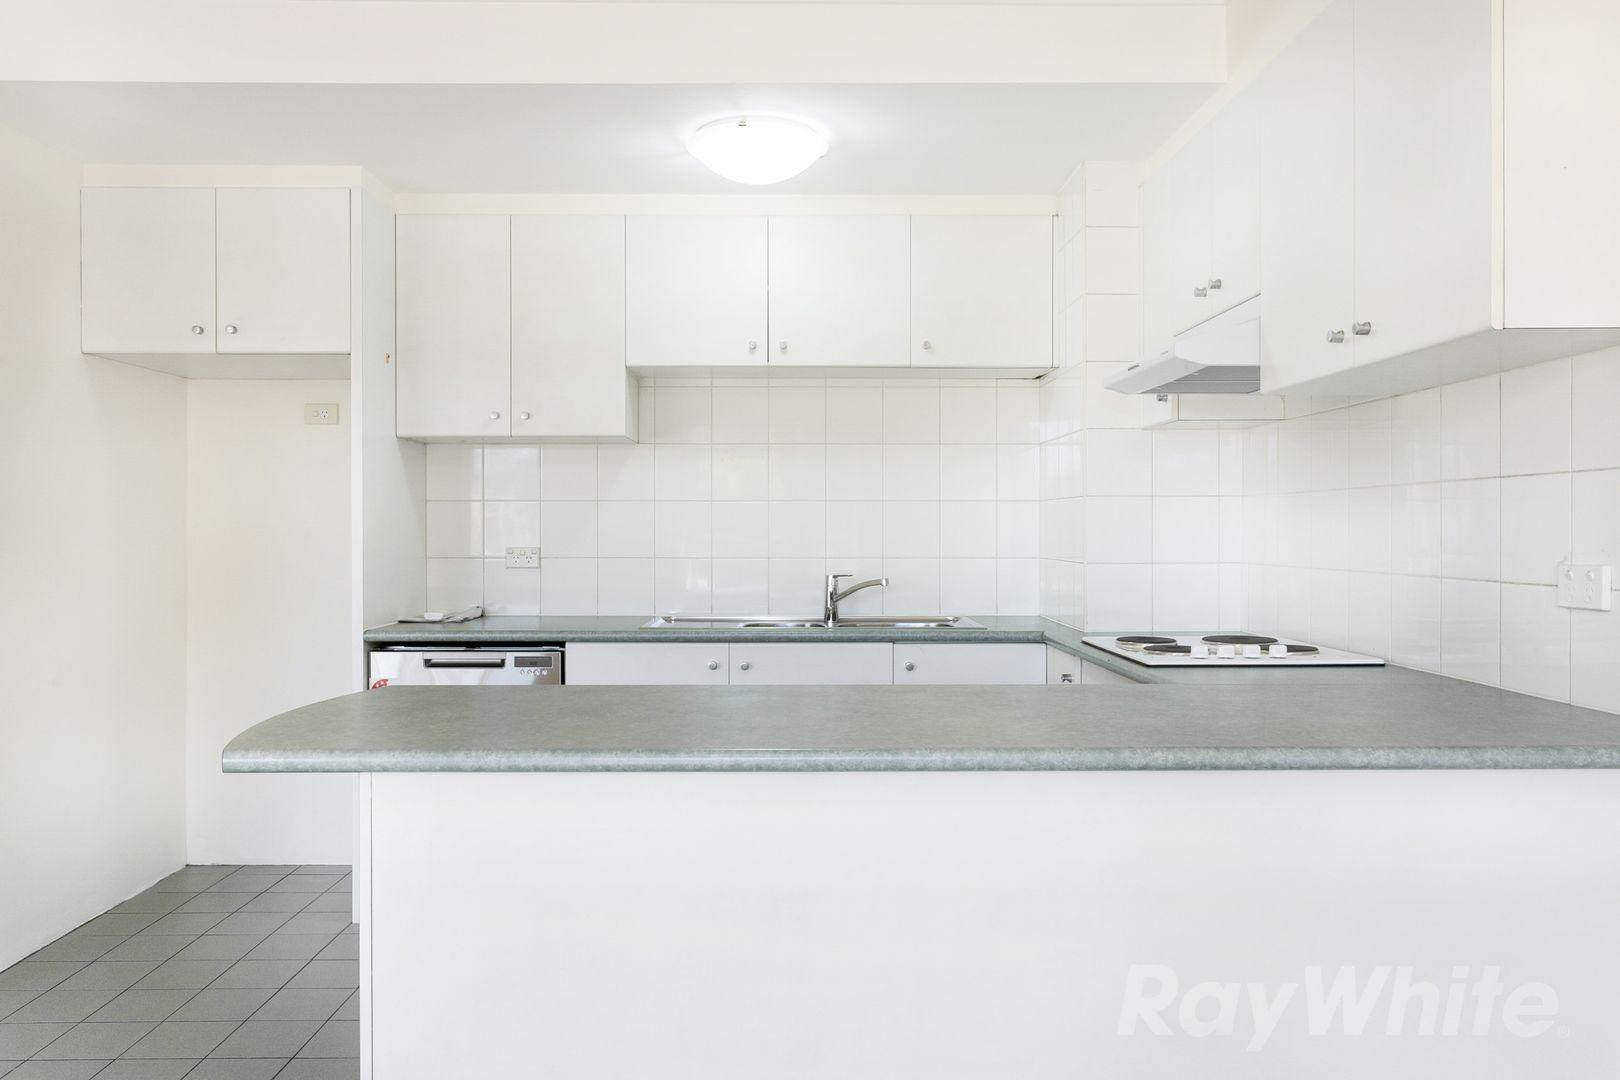 26/39 Briggs Street, Camperdown NSW 2050, Image 1